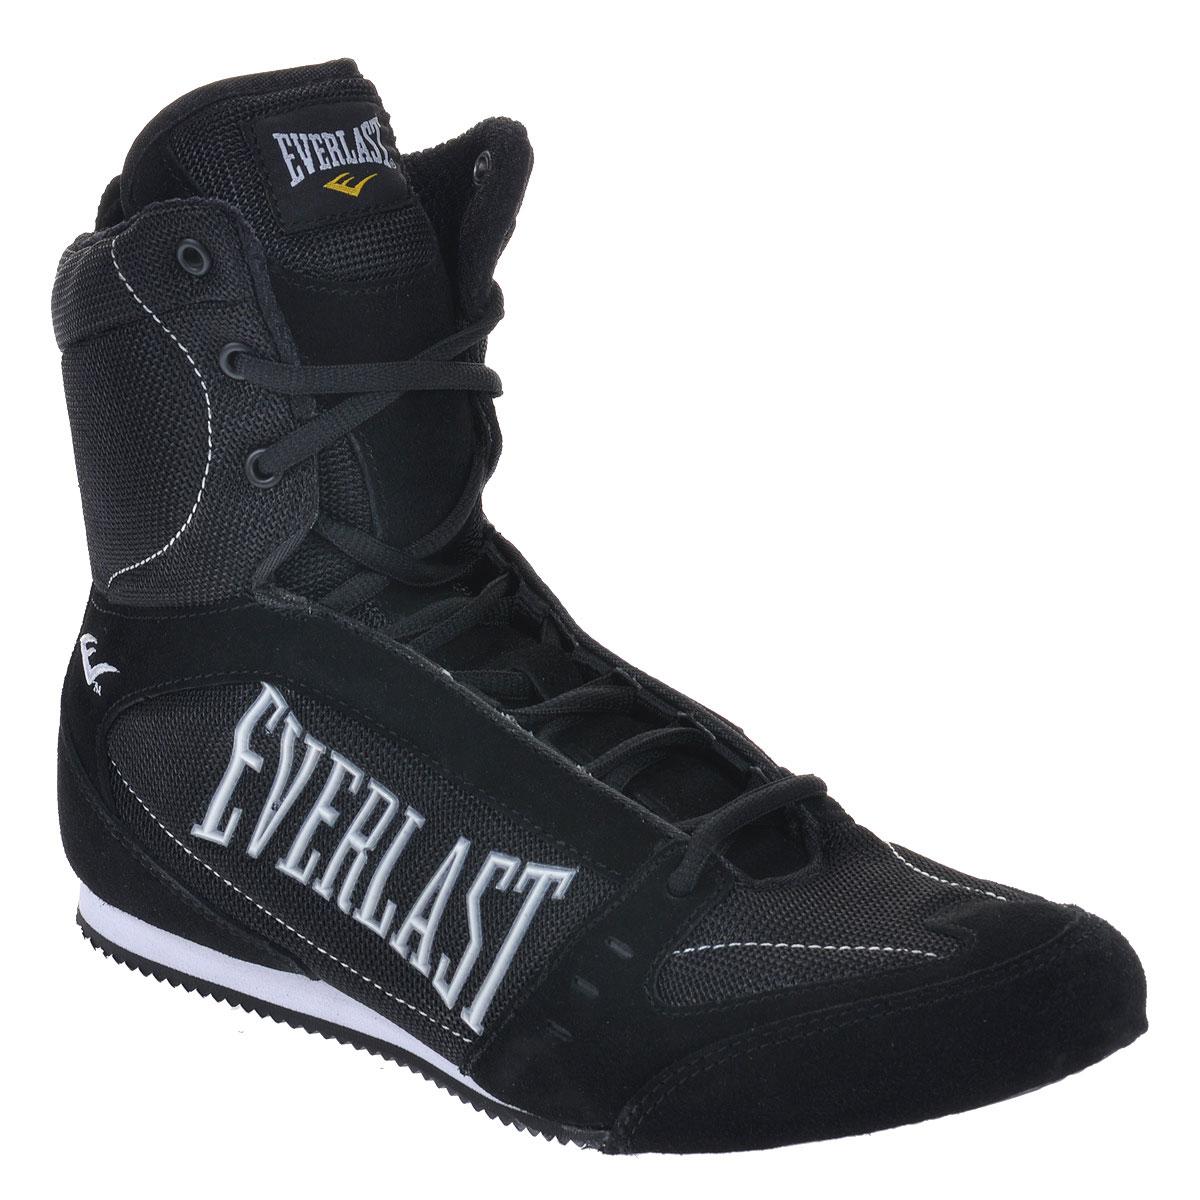 Боксерки Everlast High-Top Competition, размер 7 (RUS 39,5), цвет: черный. 527 7 BK